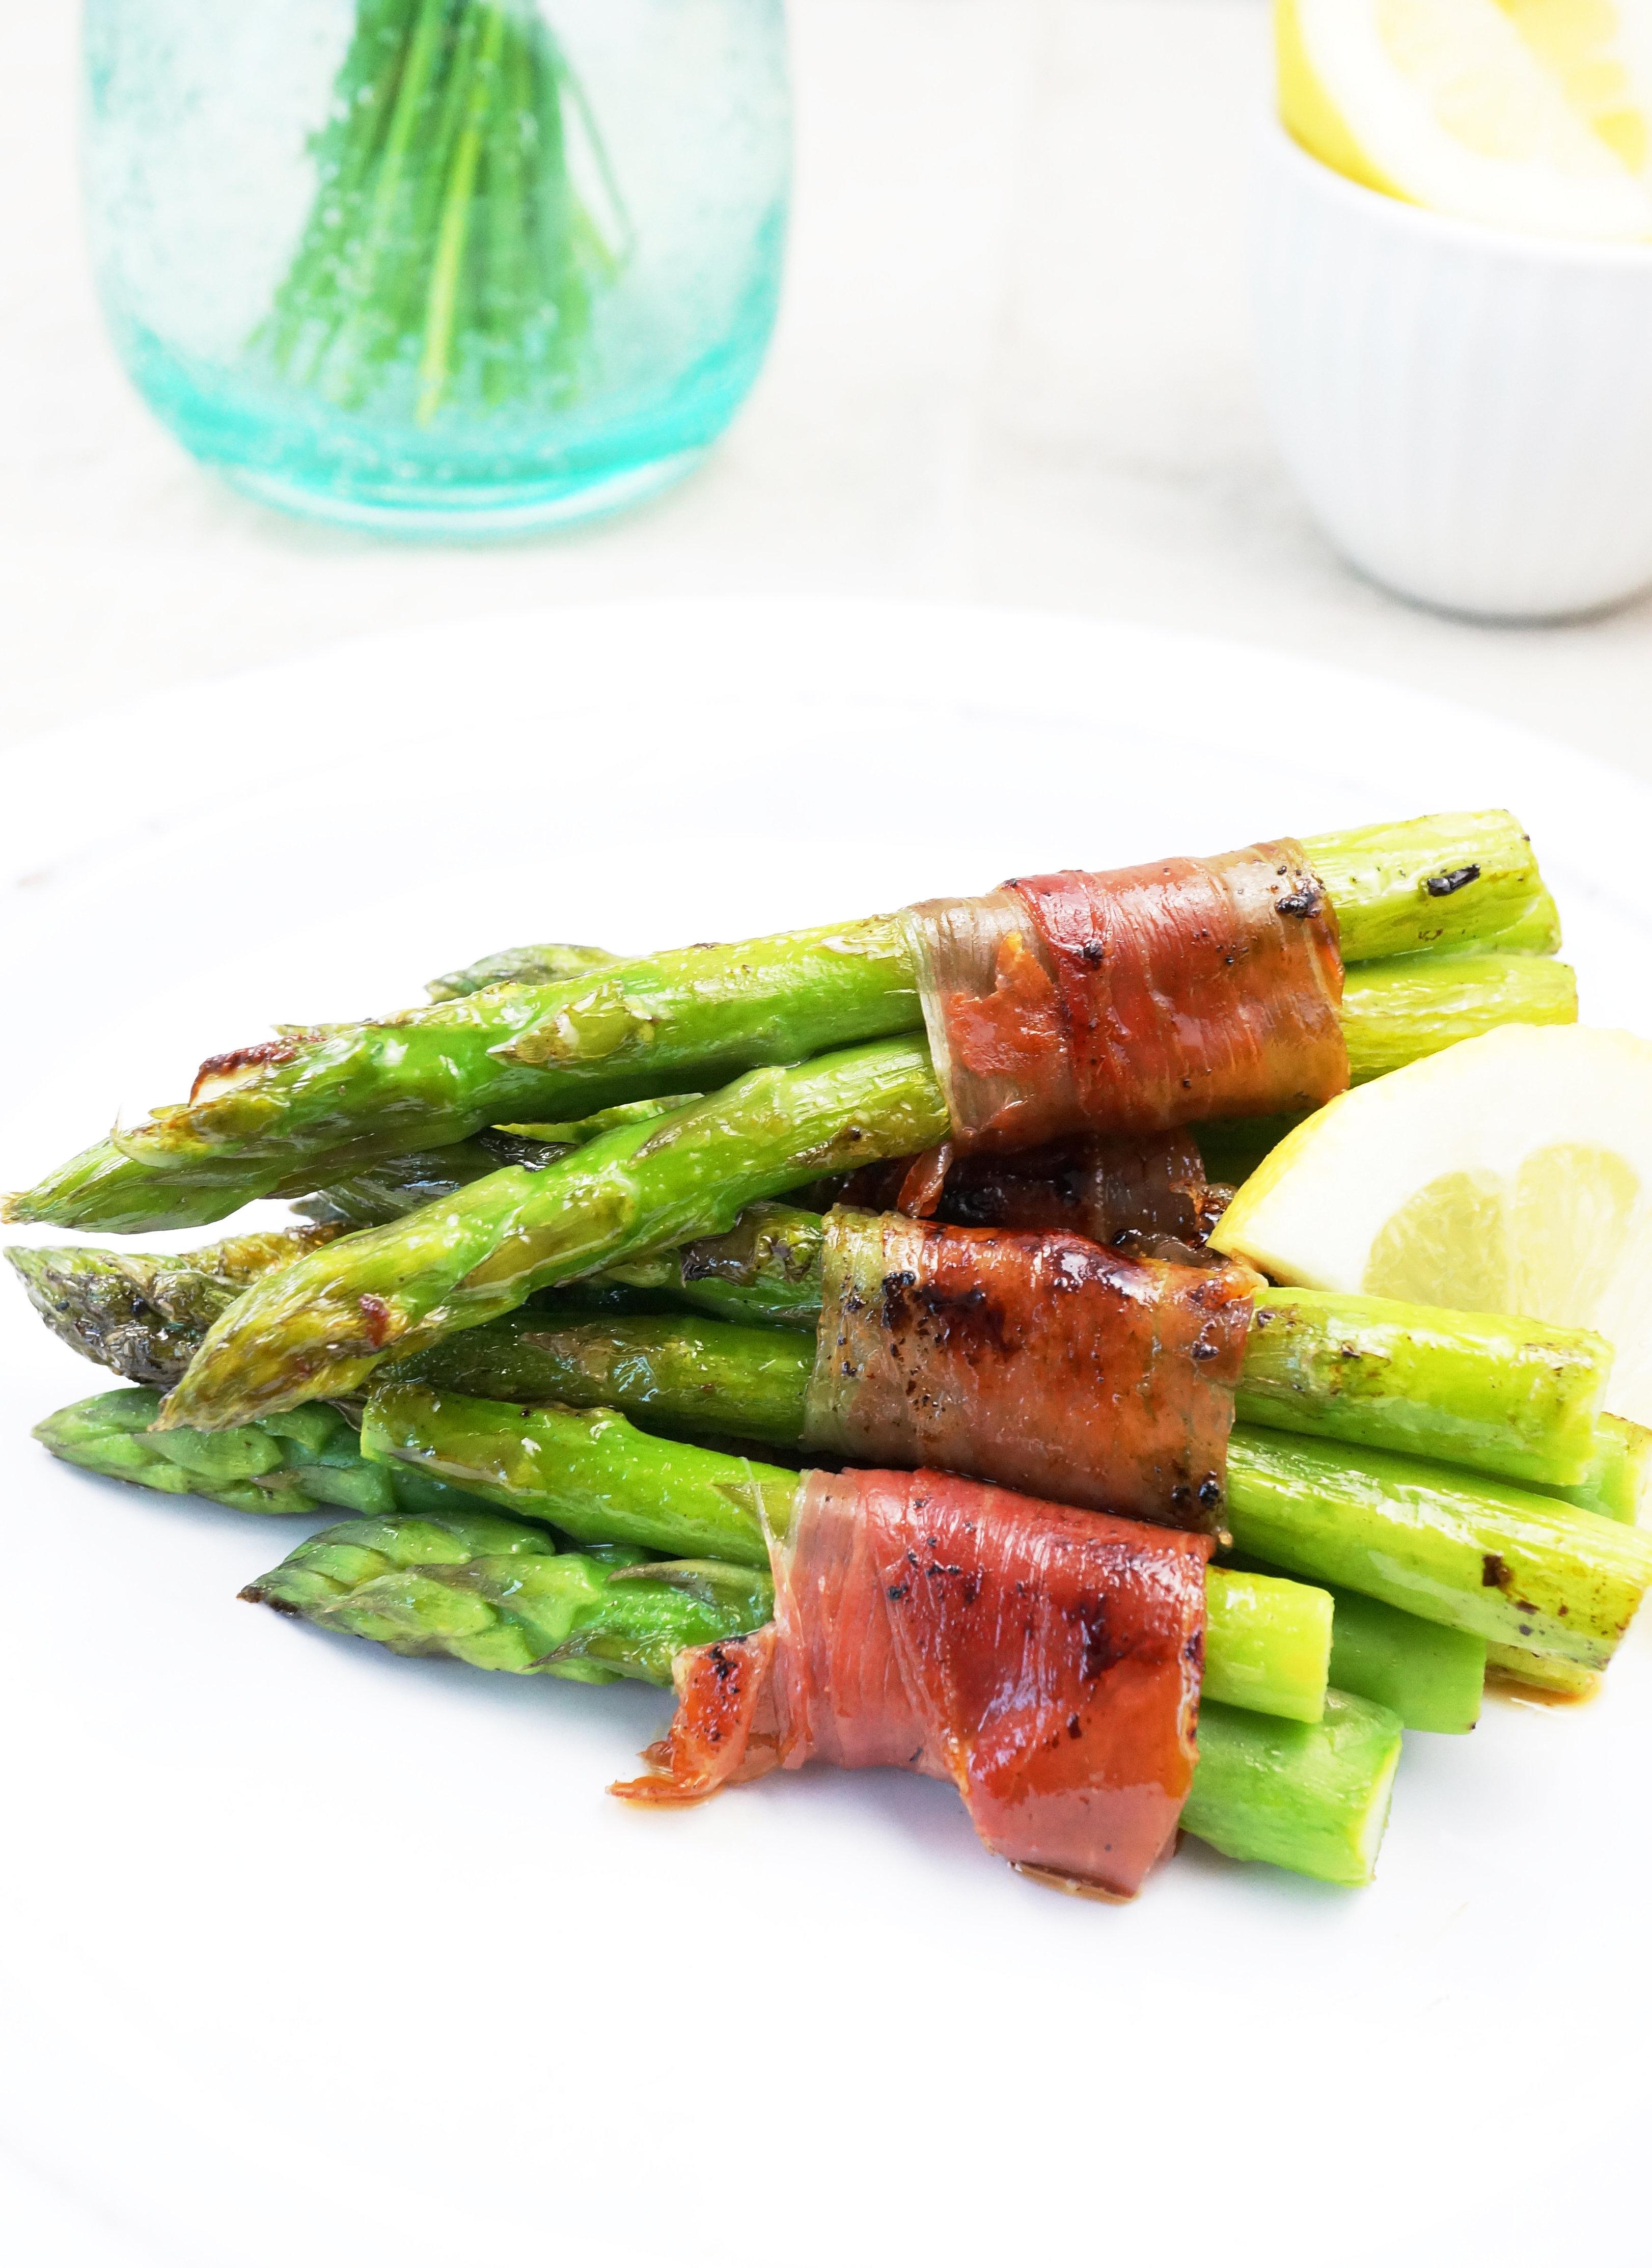 Crispy Prosciutto Wrapped Asparagus Recipes — Dishmaps